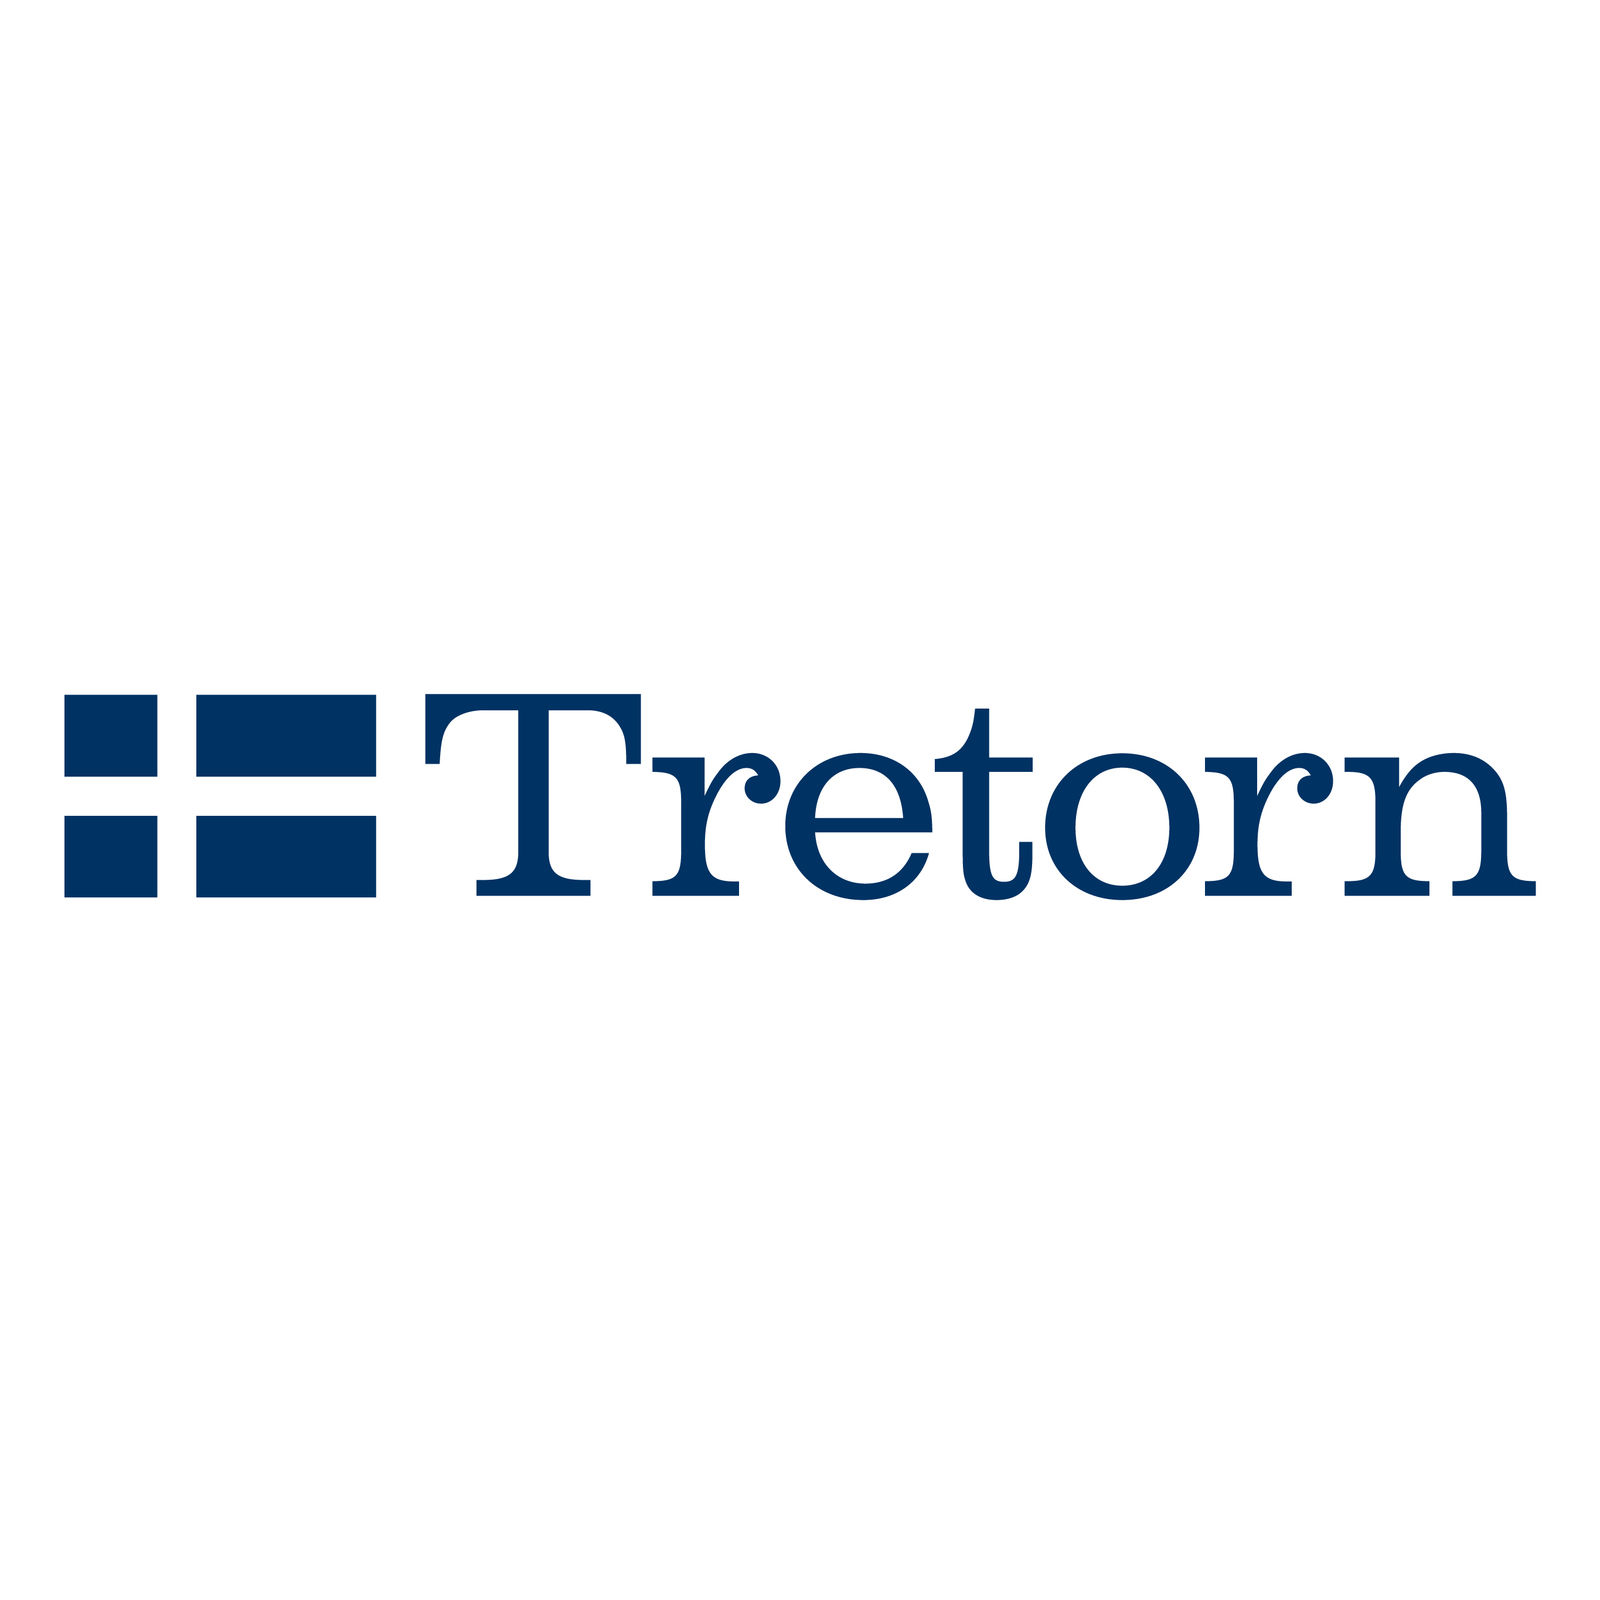 Tretorn (Image 1)